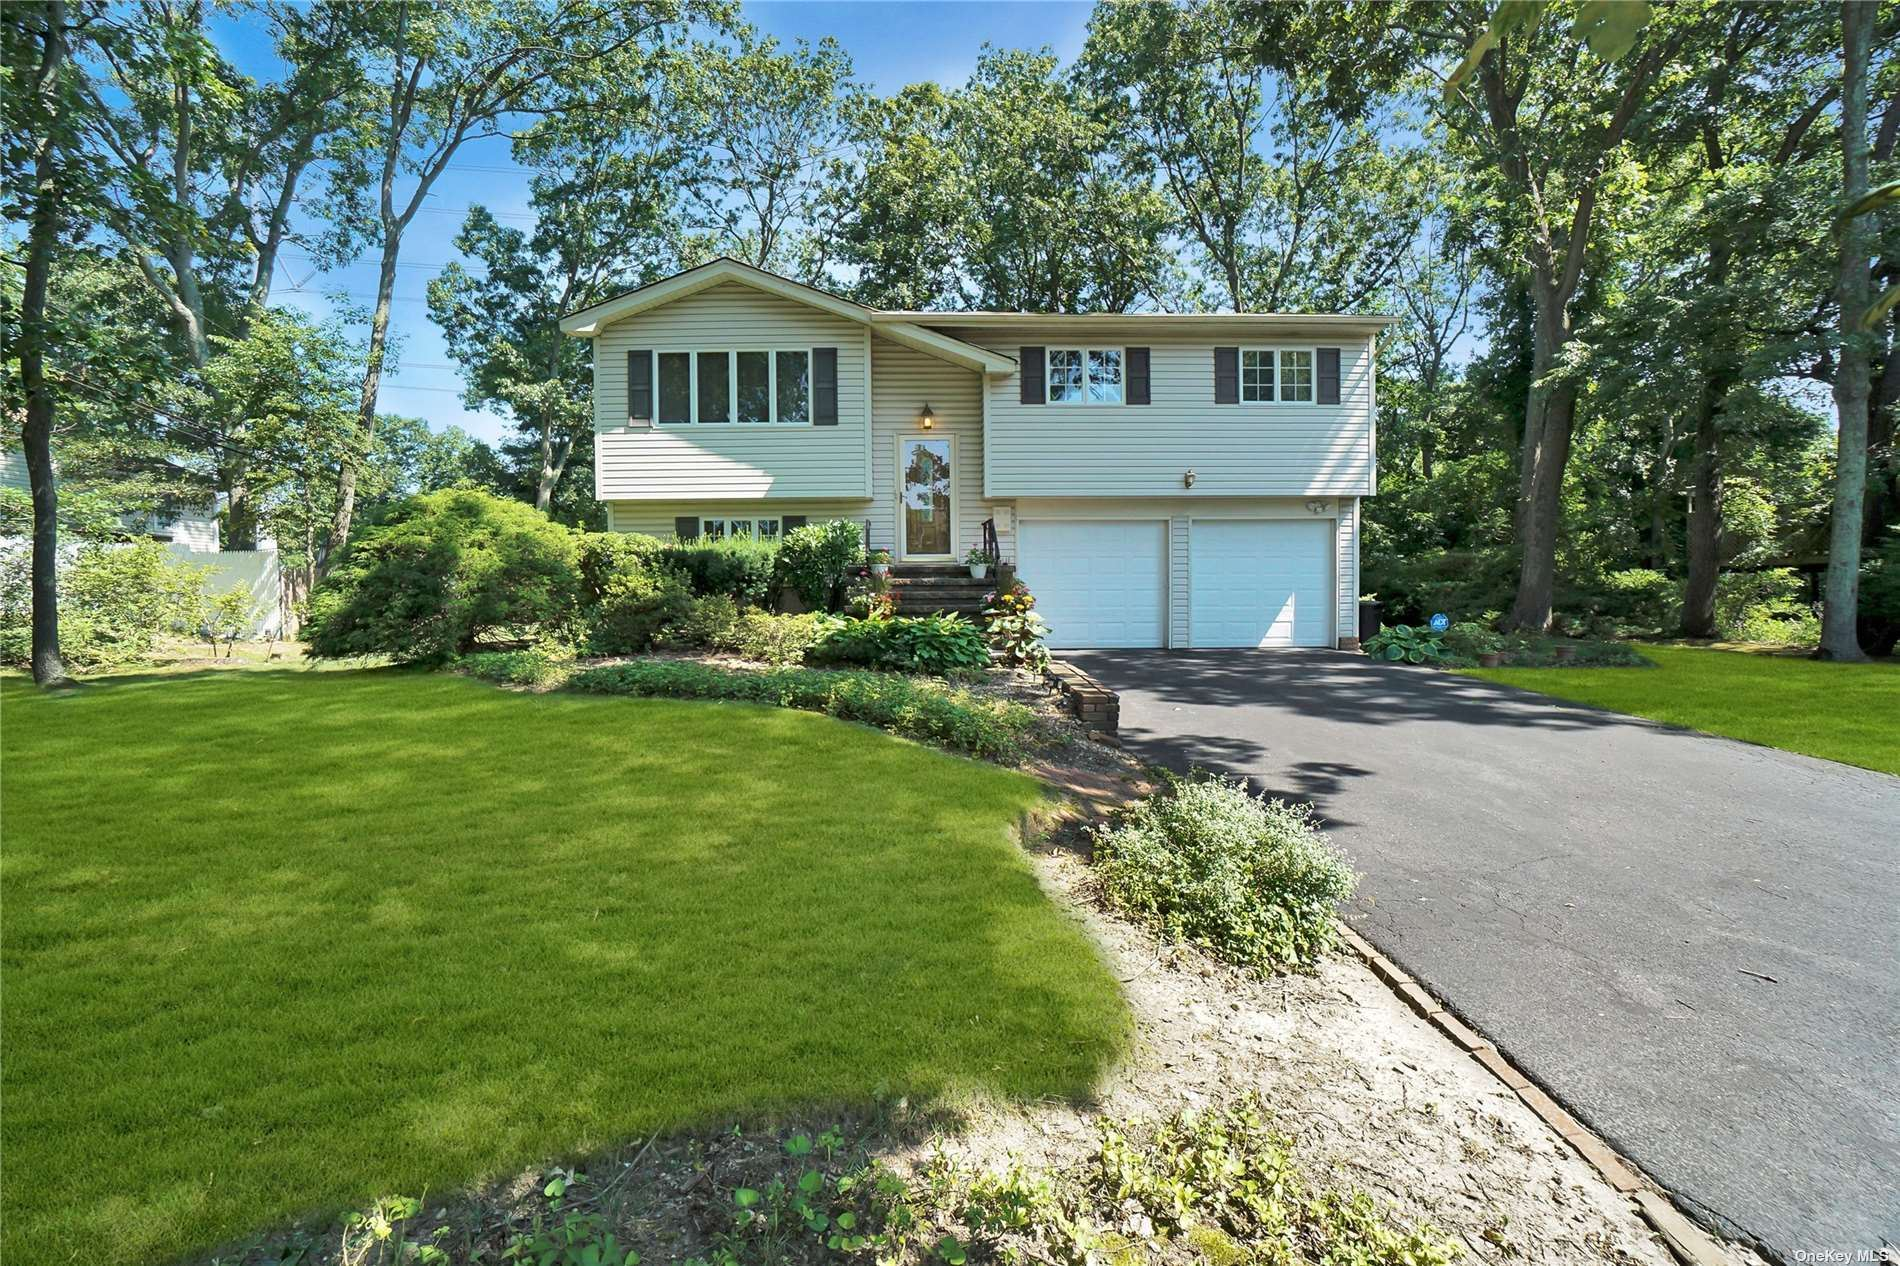 25 Sunflower Drive, Hauppauge, NY 11788 - MLS#: 3335129